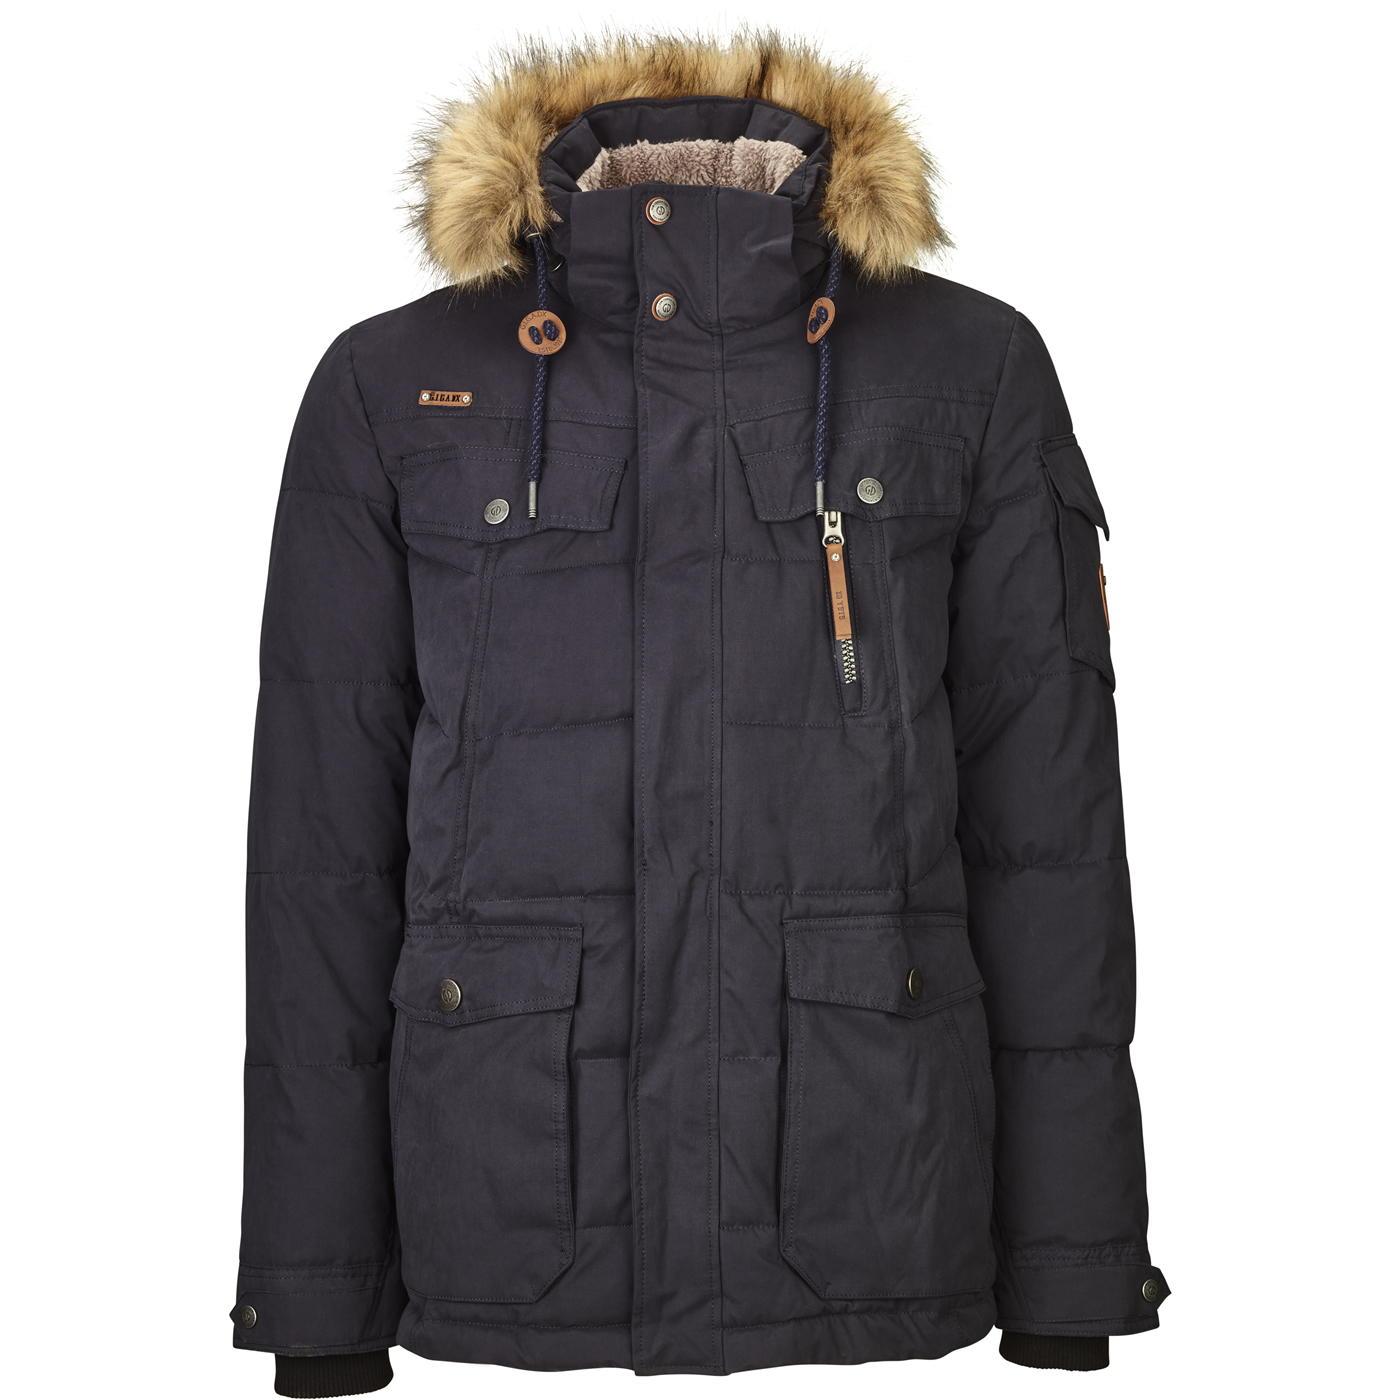 Killtec Nakubo Winter Funktionsjacke Herren Übergrößen